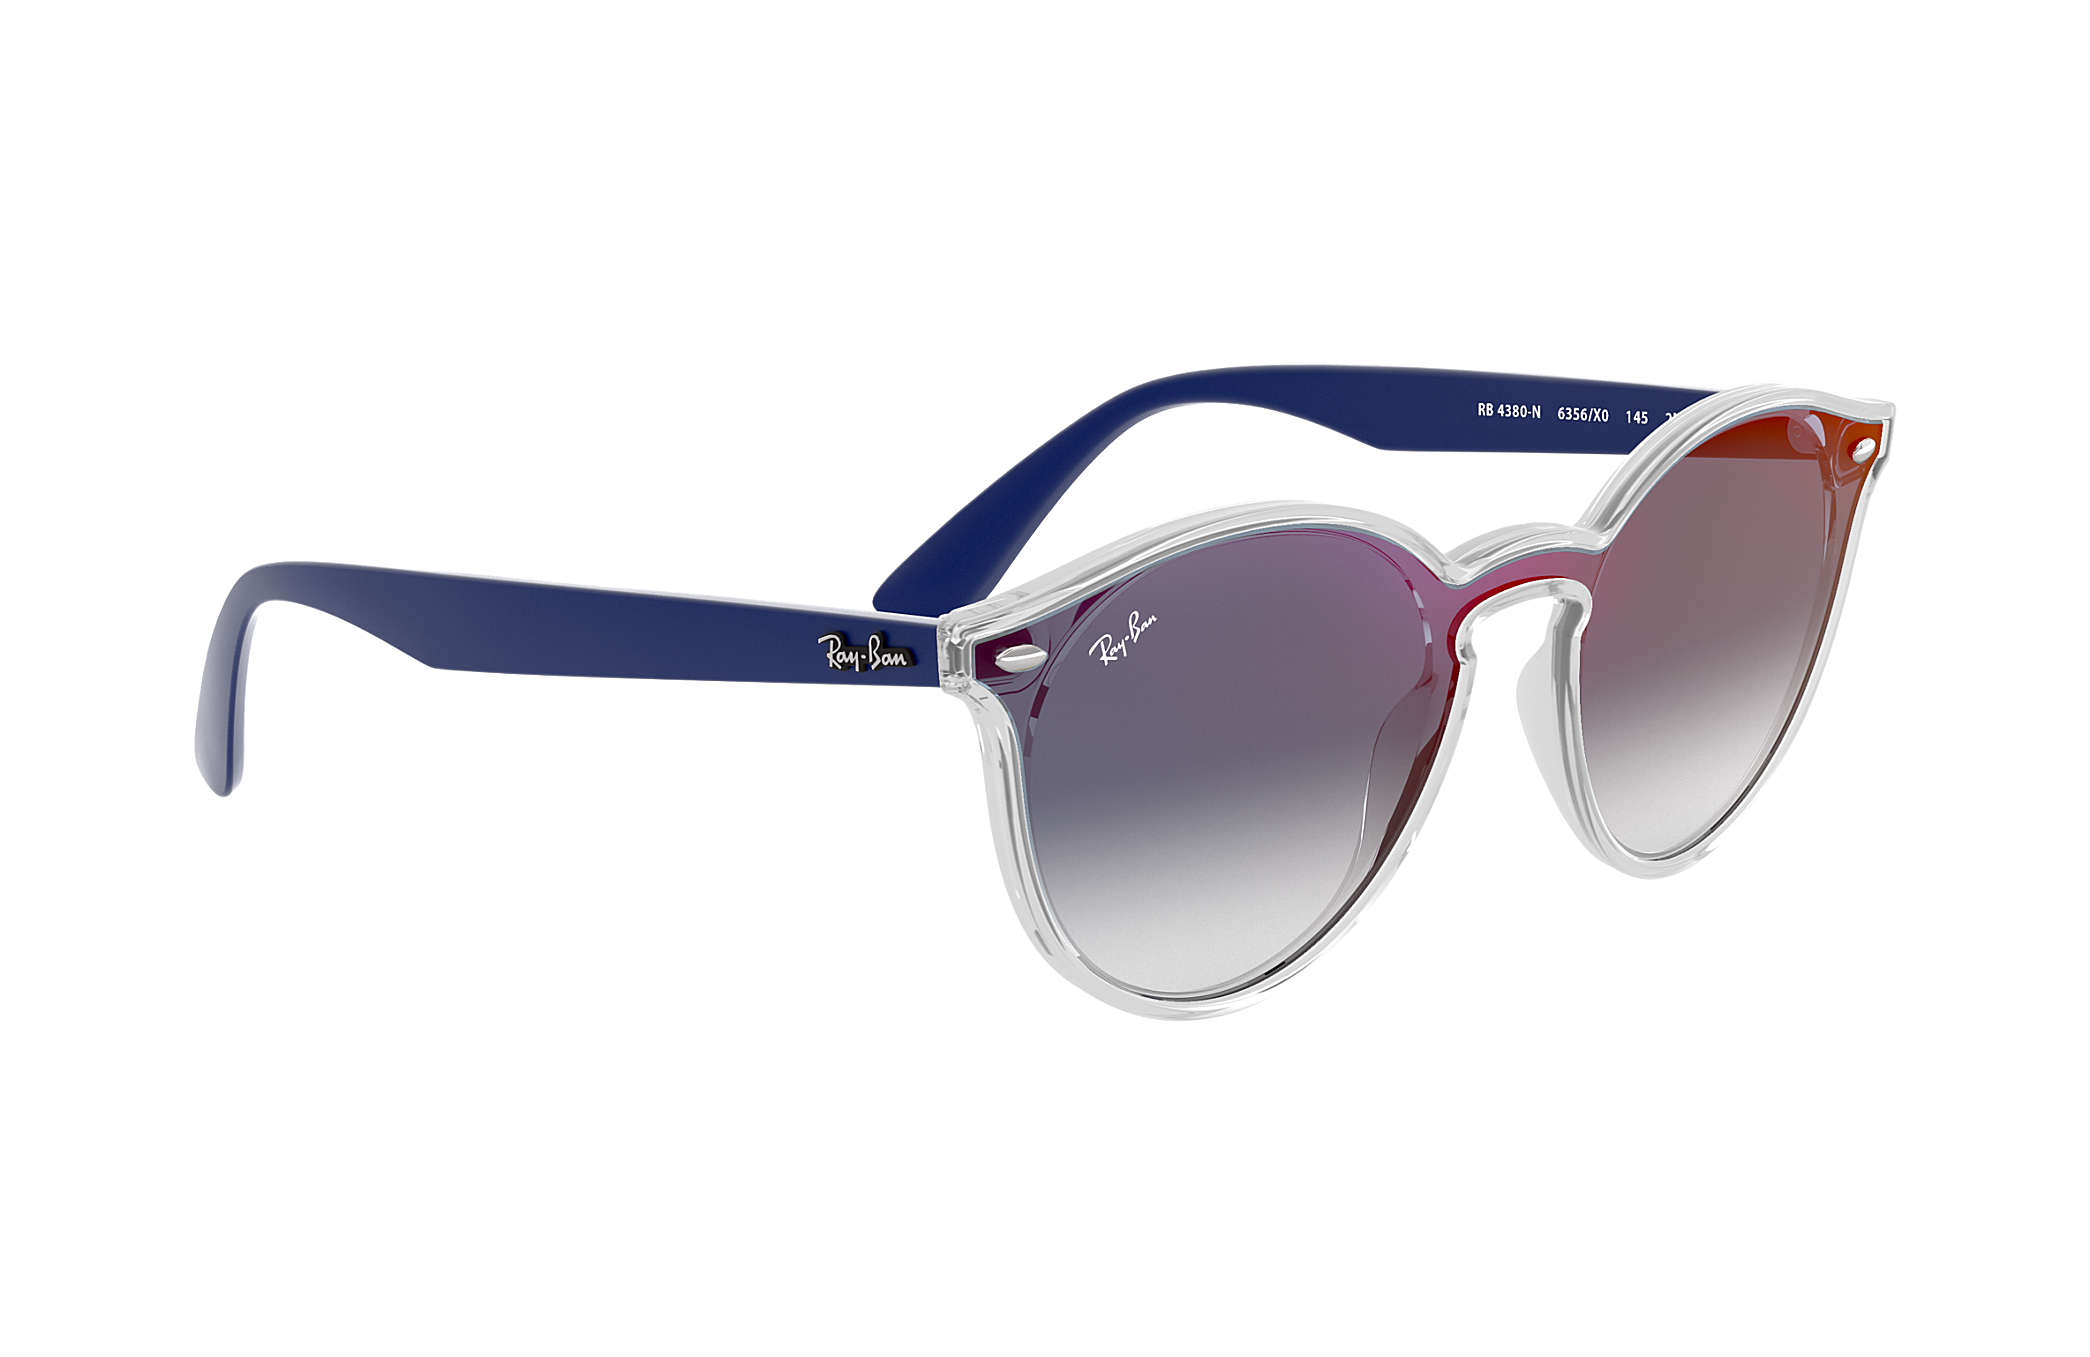 464f93e4d Ray-Ban Blaze Rb4380n RB4380N Transparente - Nylon - Lentes Azul ...